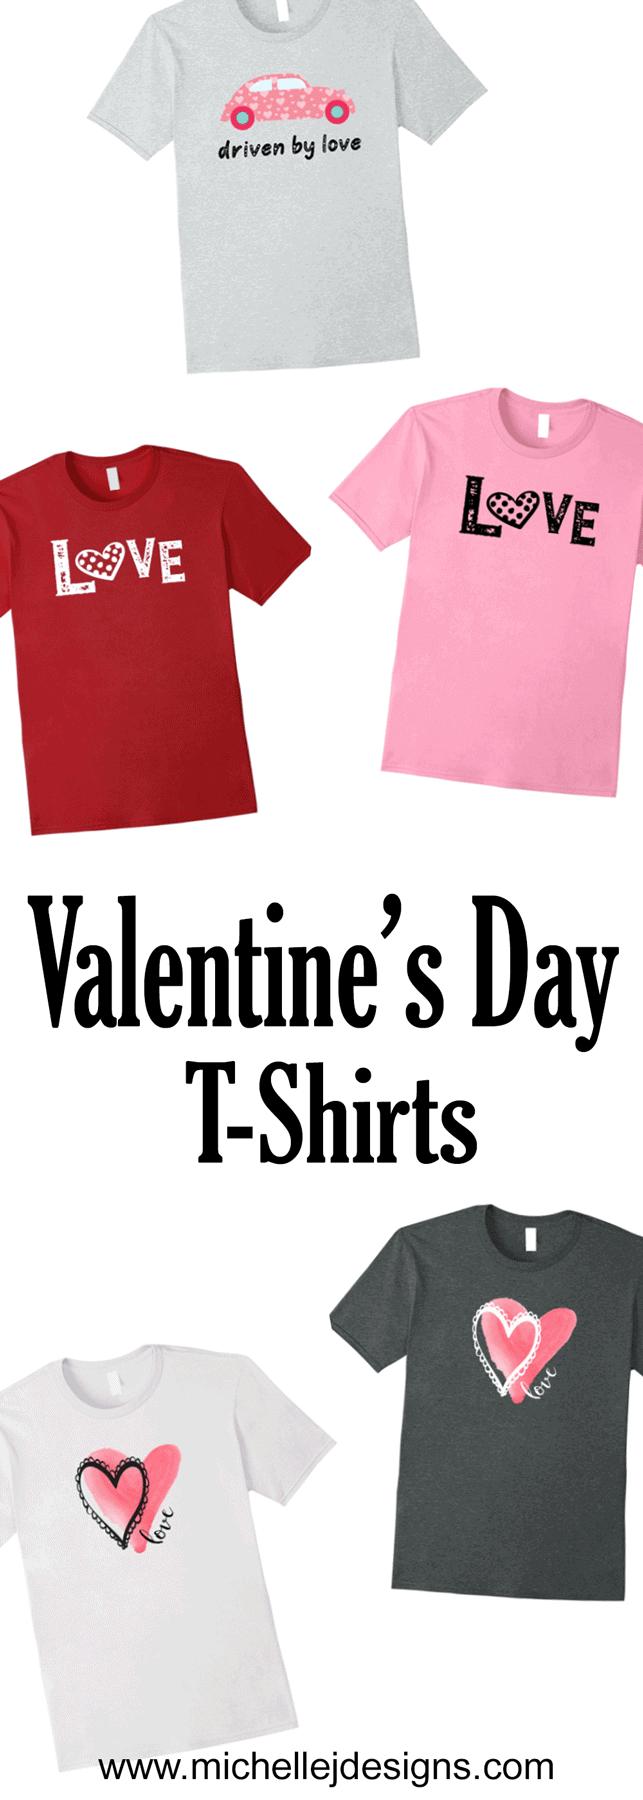 Valentine Tshirt, Valentine's Day Shirts, Valentine's Day tee, Love Tshirt, Tshirts for Valentine's Day, #Valentinesday #valentinesdaytshirt #tshirts #pinktshirts #love #lovetshirt